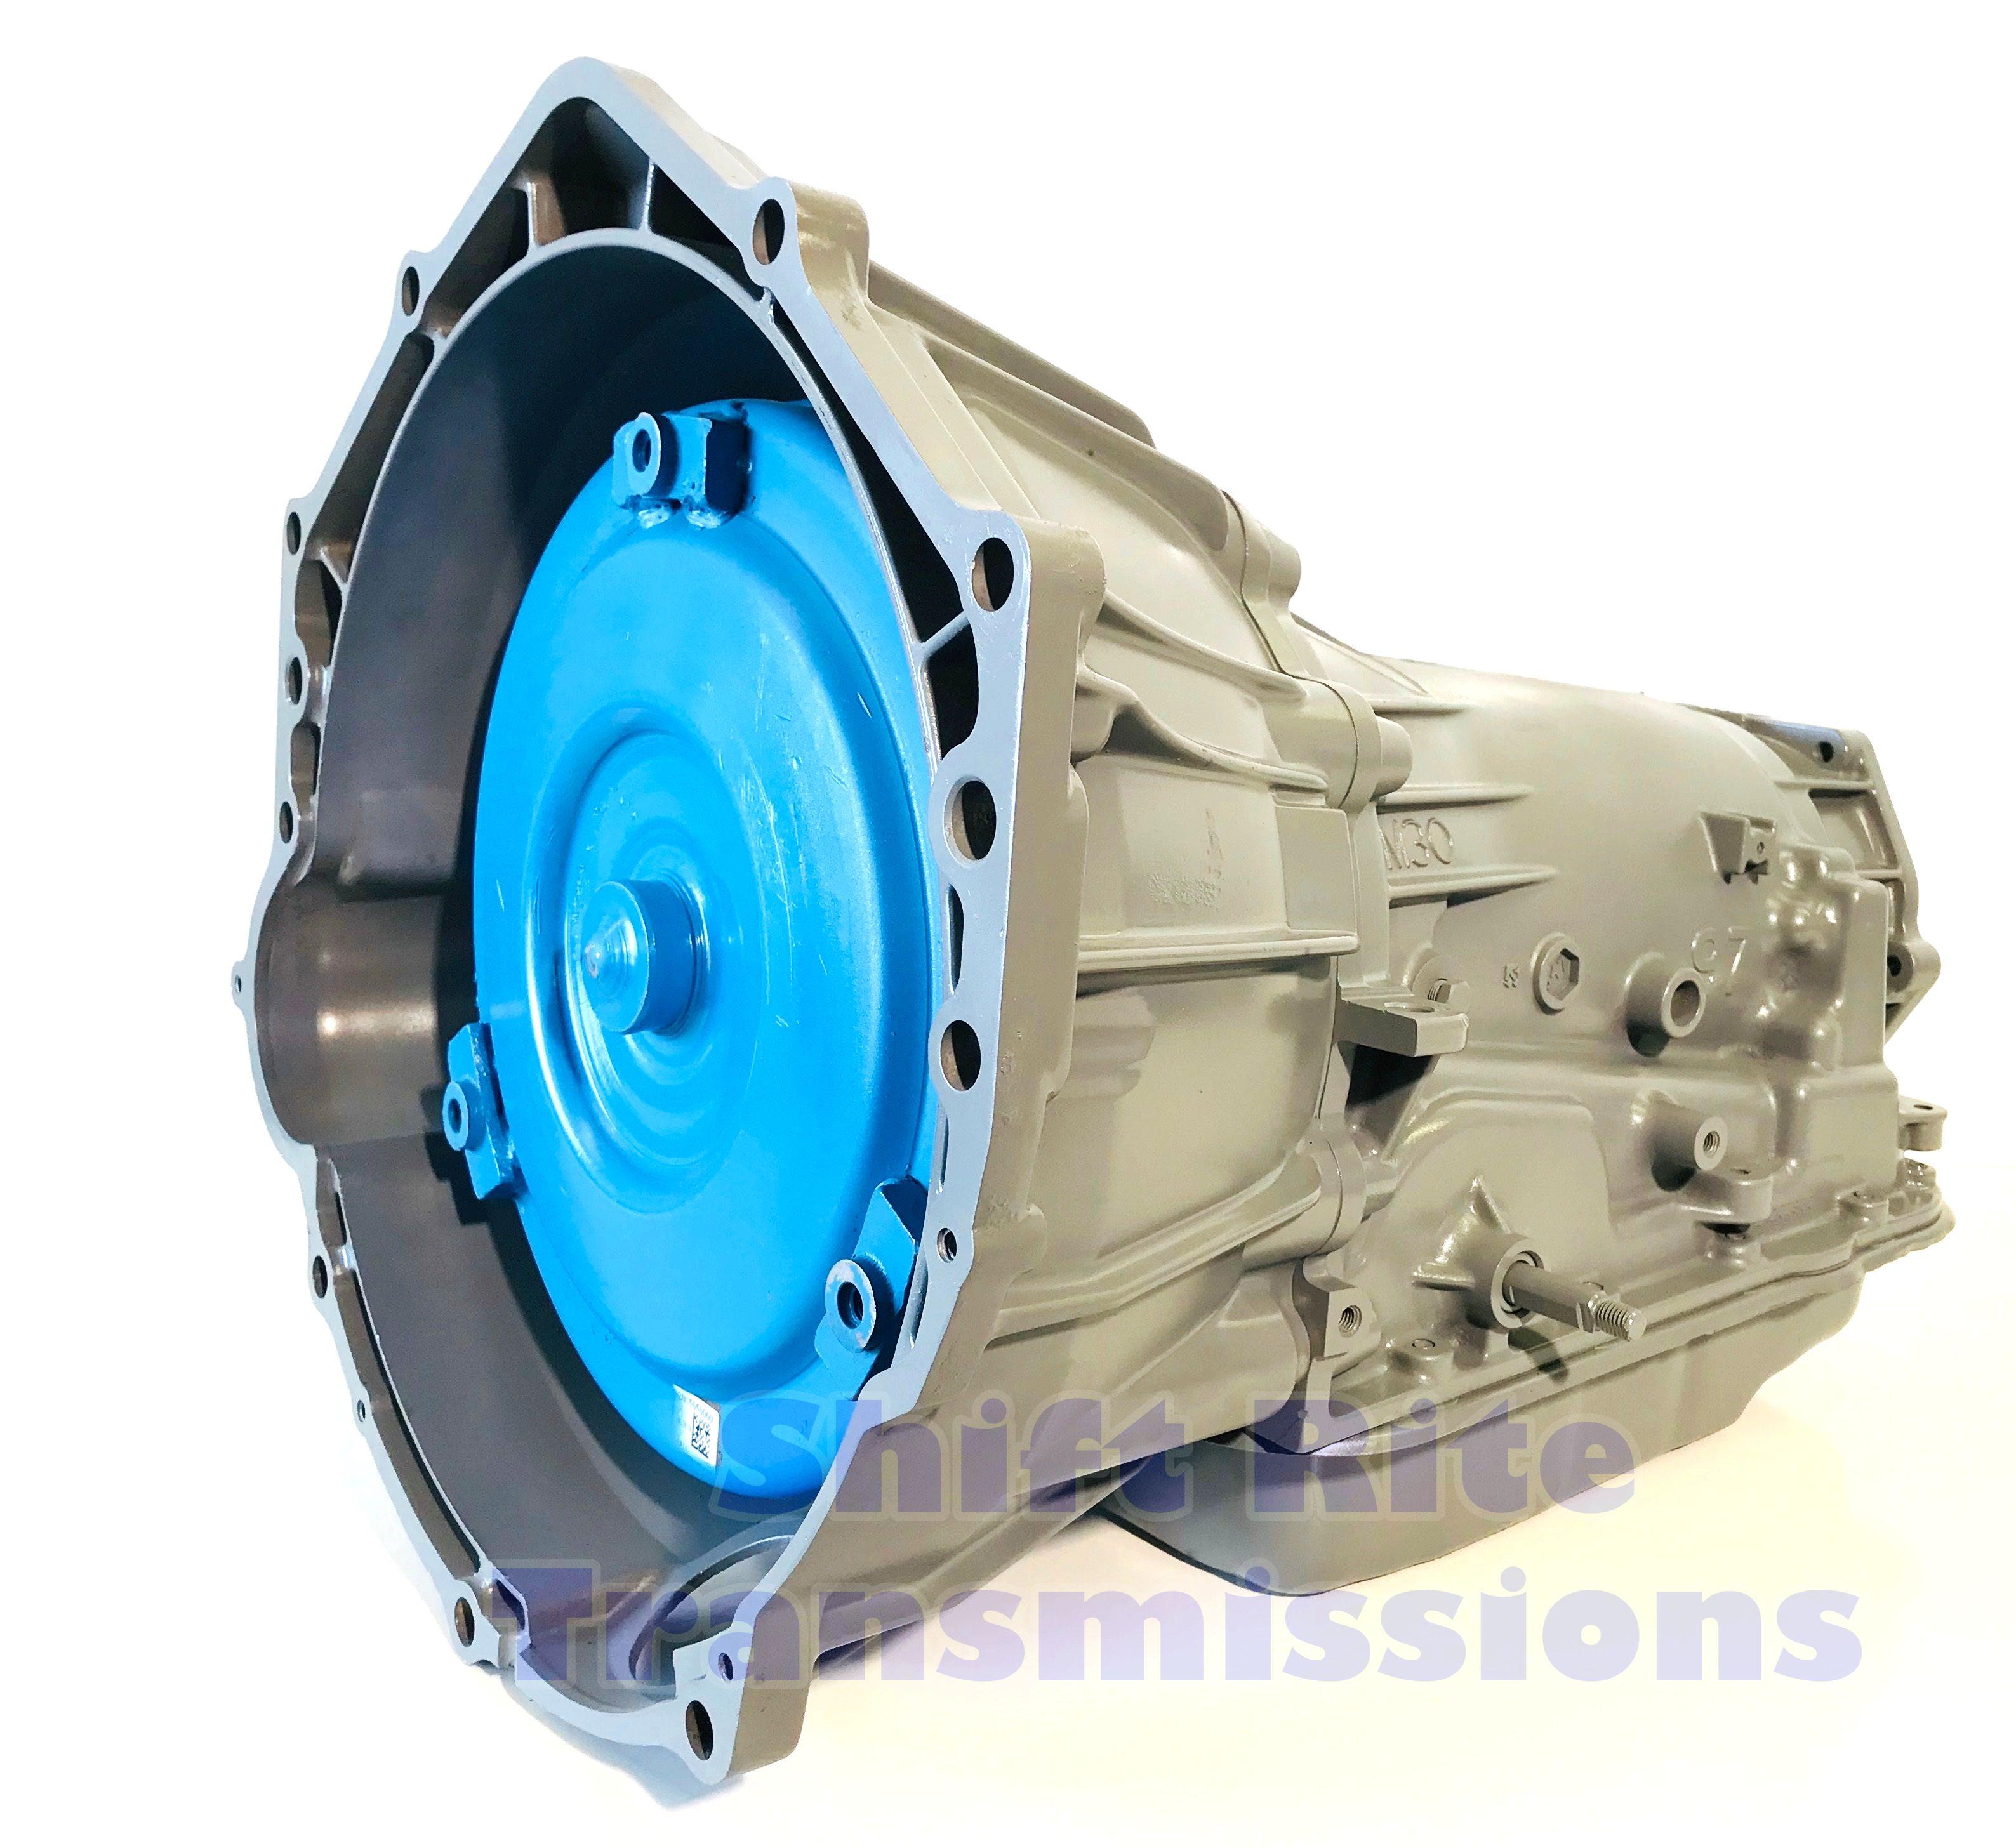 4L60E 1998-2005 4X4 (298mm) TRANSMISSION 5 7L 5 0L 4 3L